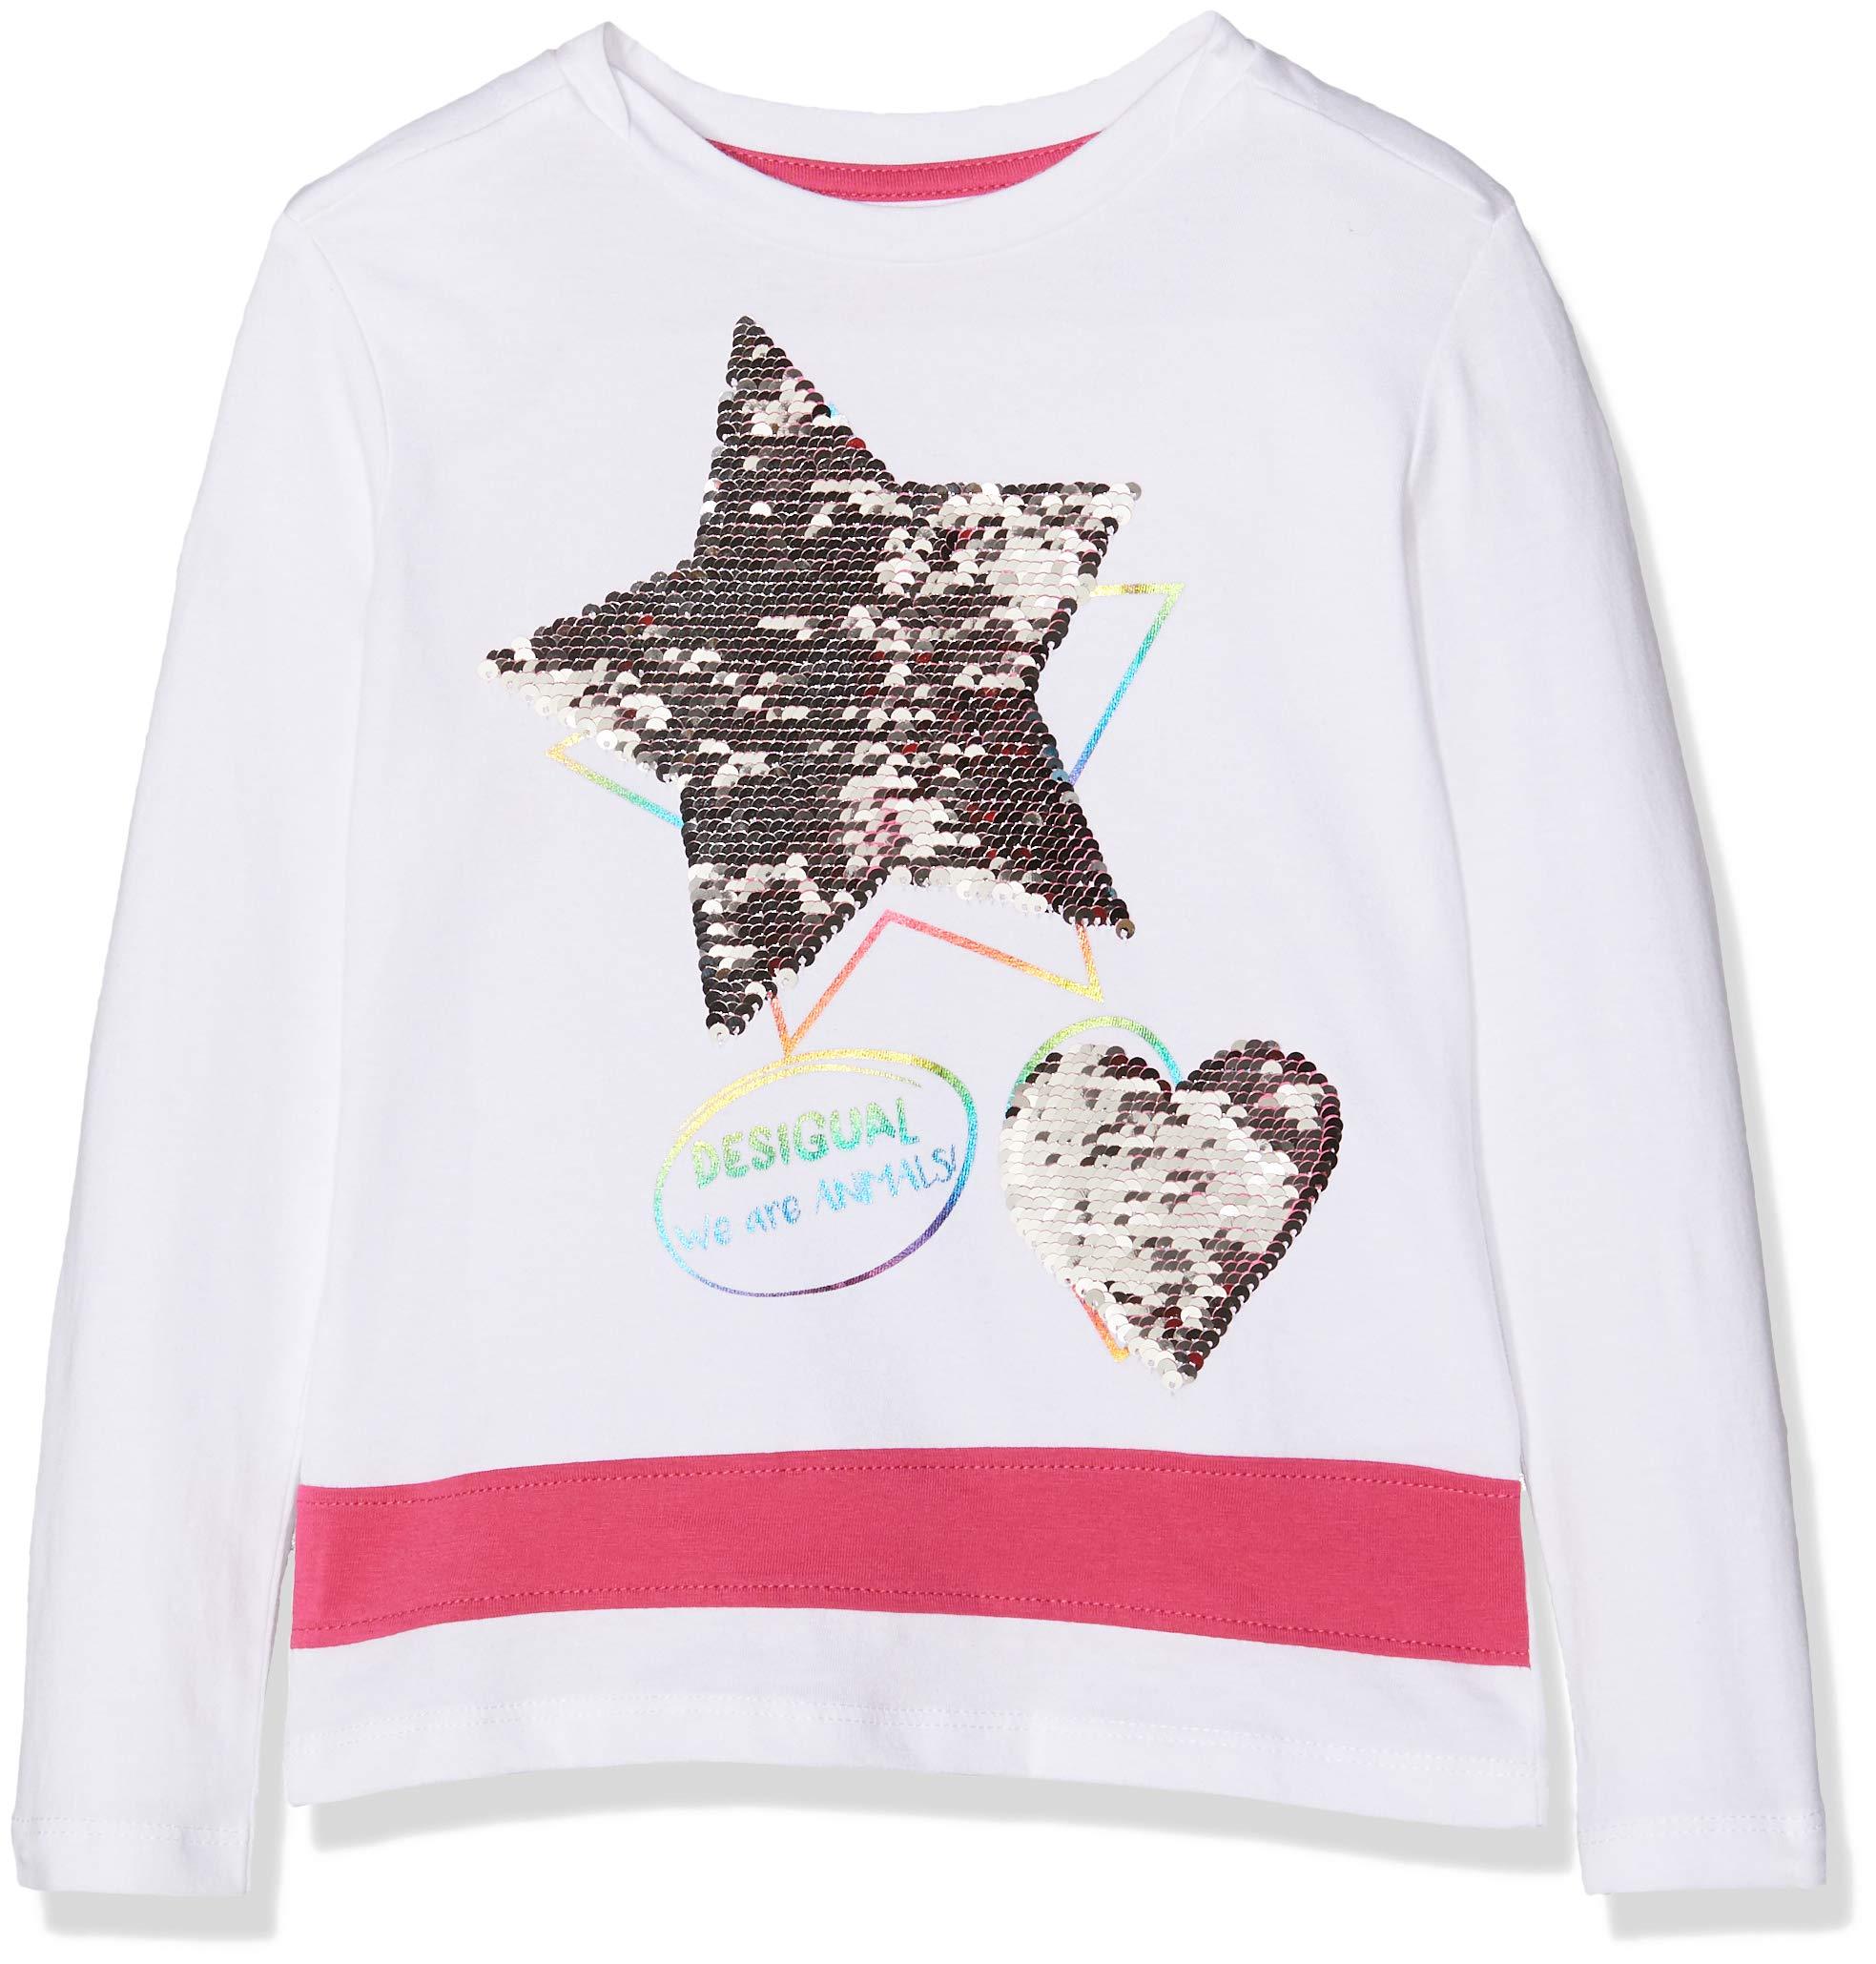 Desigual TS_Hamilton Camiseta para Niñas